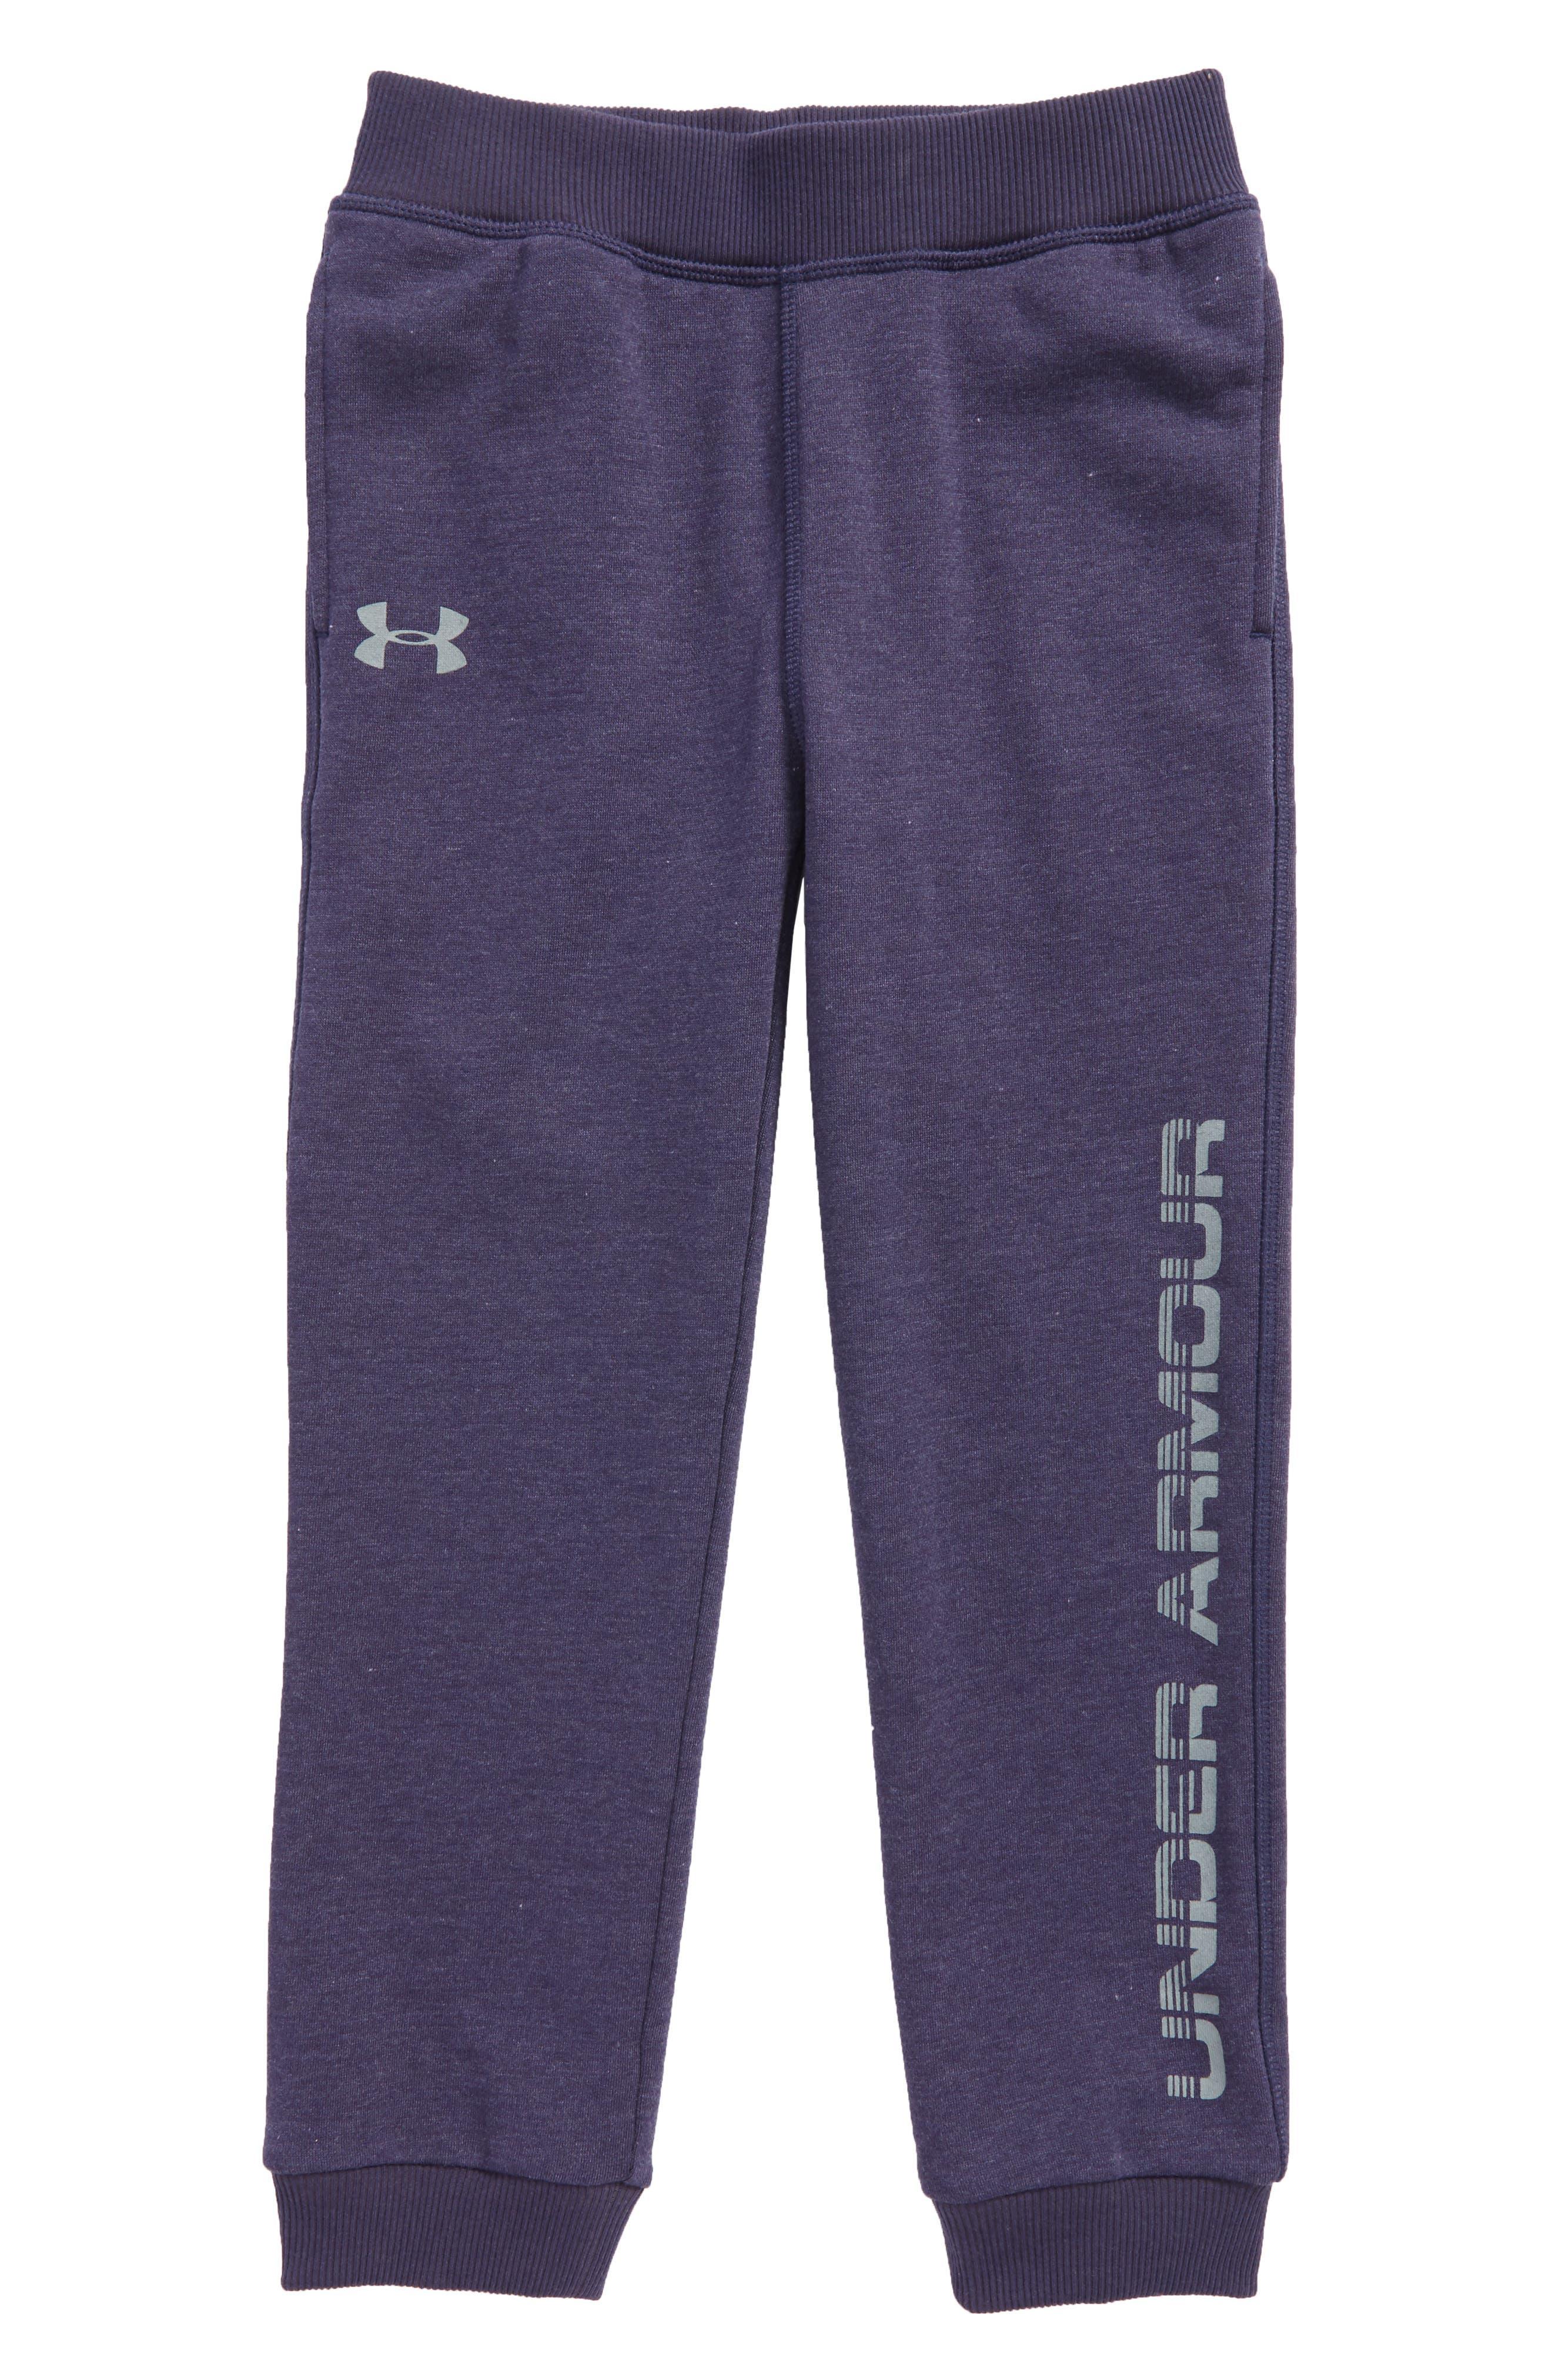 Threadborne Logo Graphic Sweatpants,                         Main,                         color, Midnight Navy